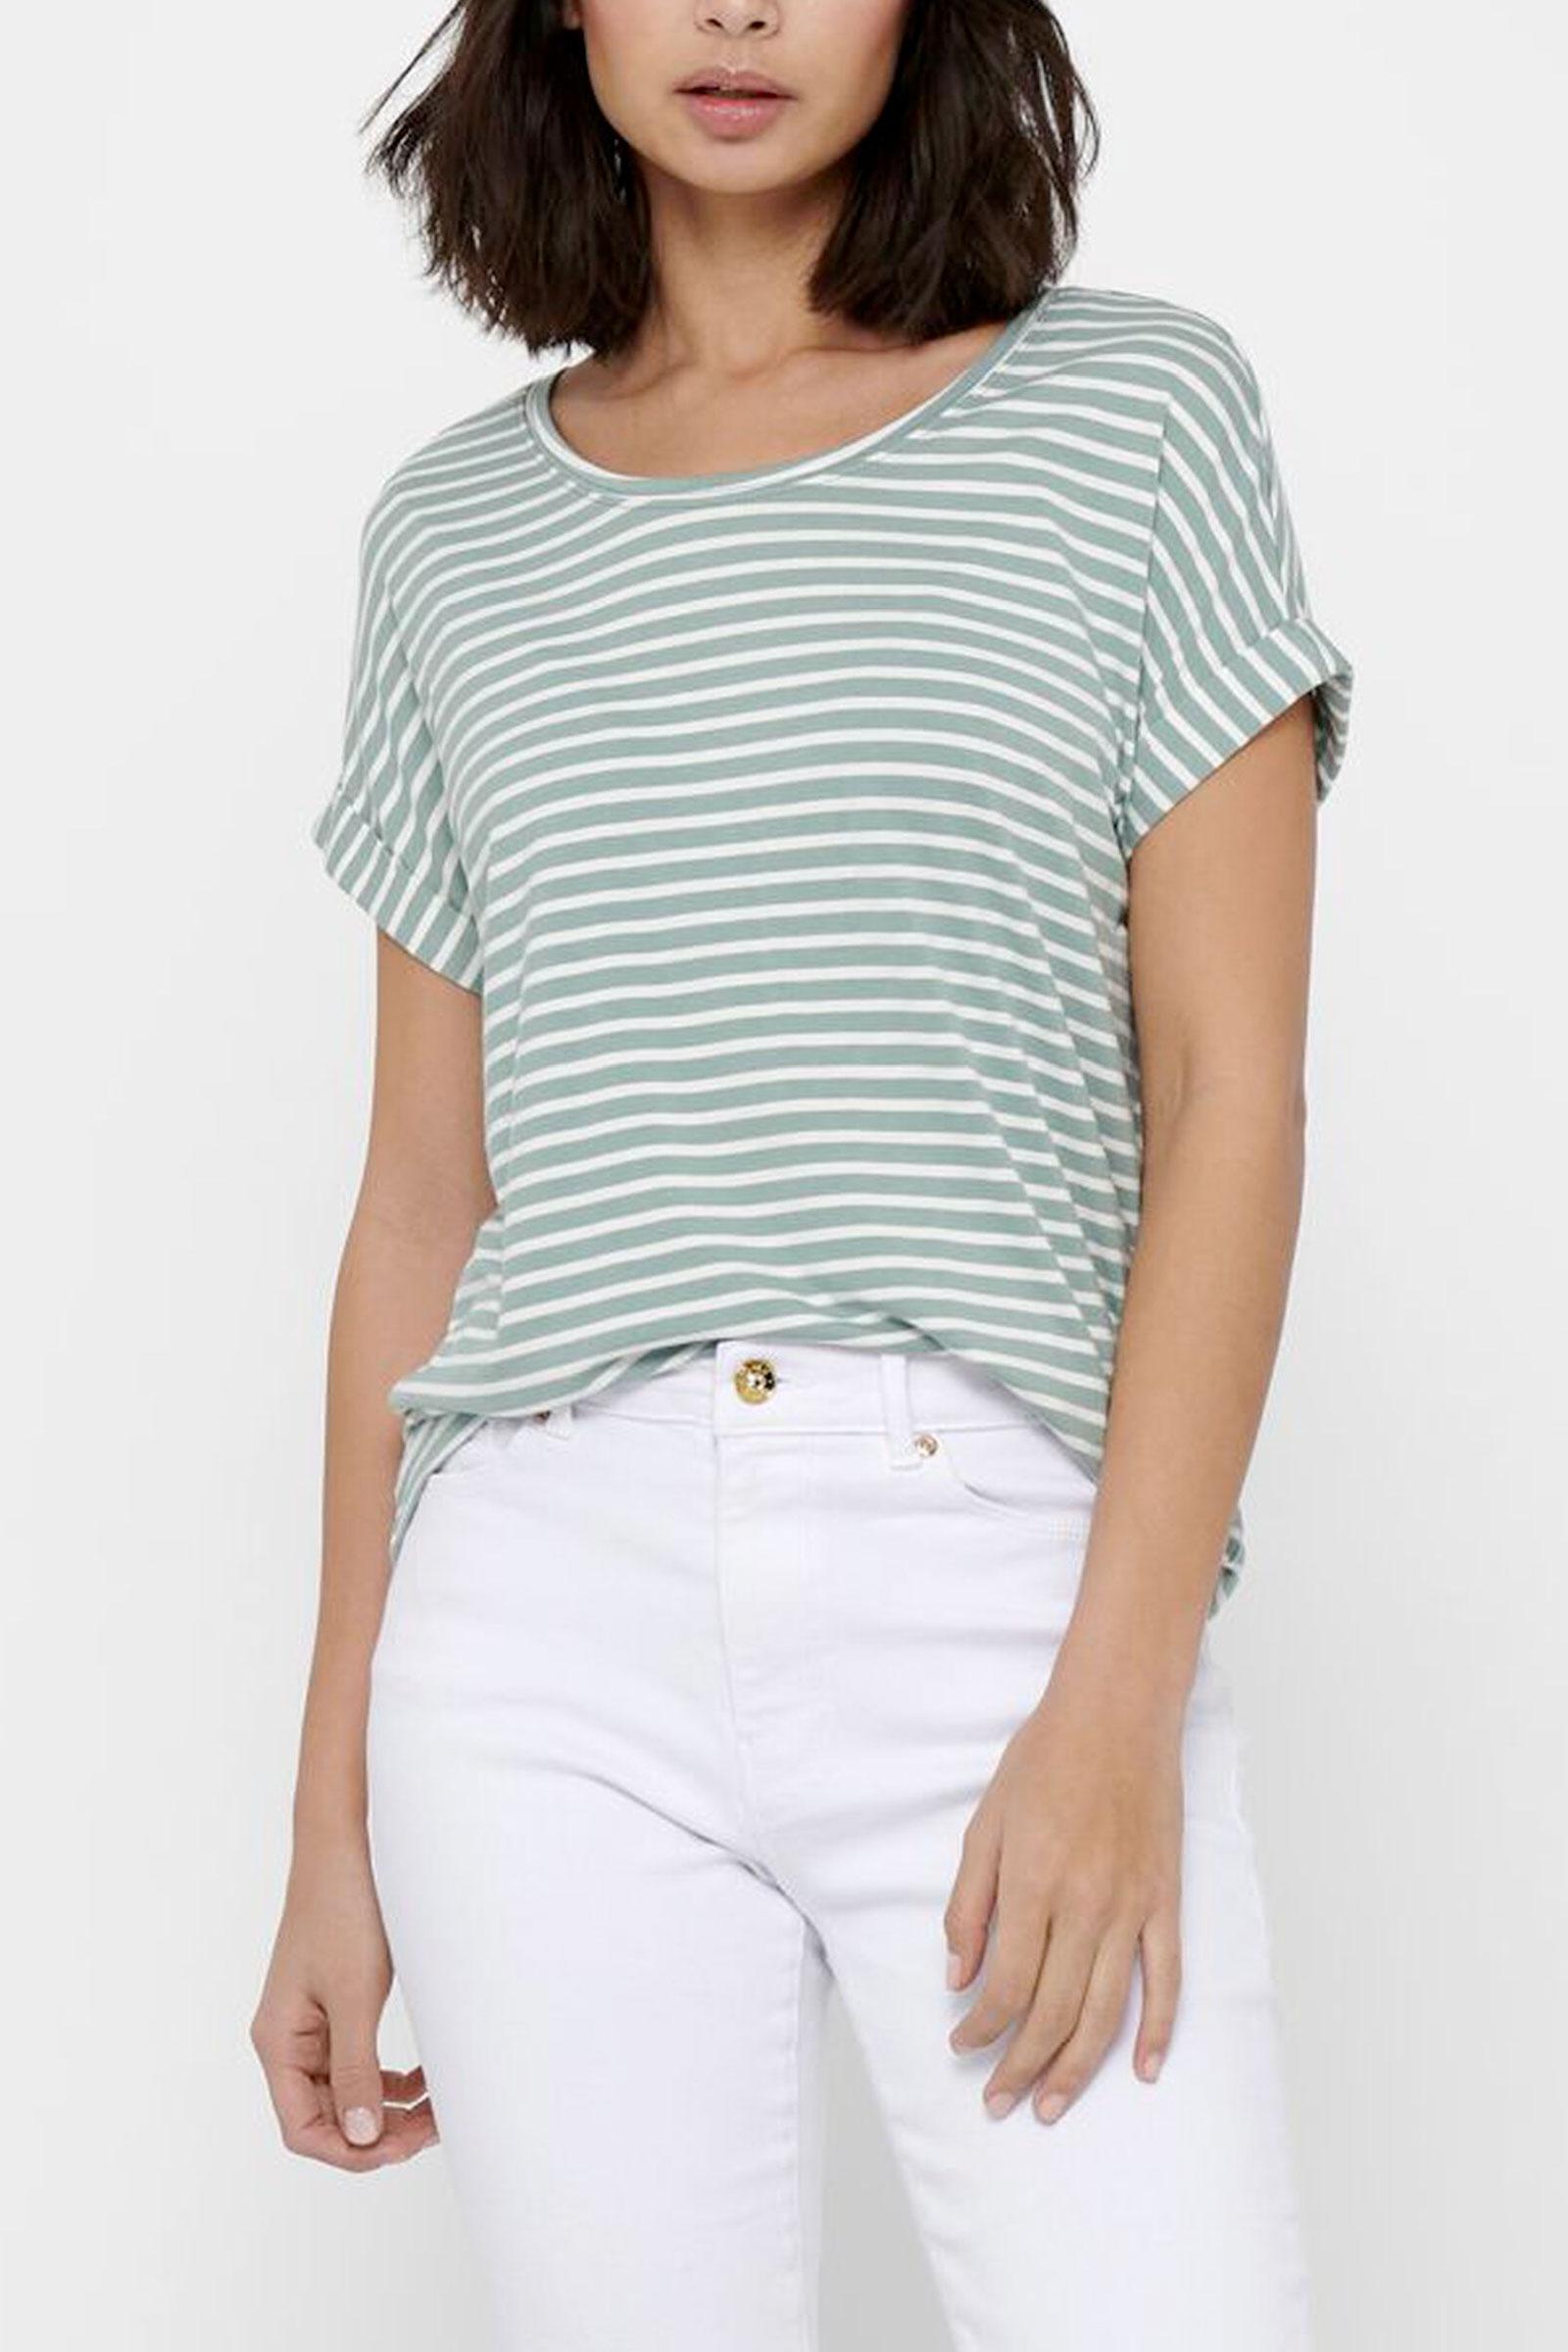 ONLY Woman T-Shirt ONLY | T-Shirt | 15206243Stripes-CLOUD DANCER